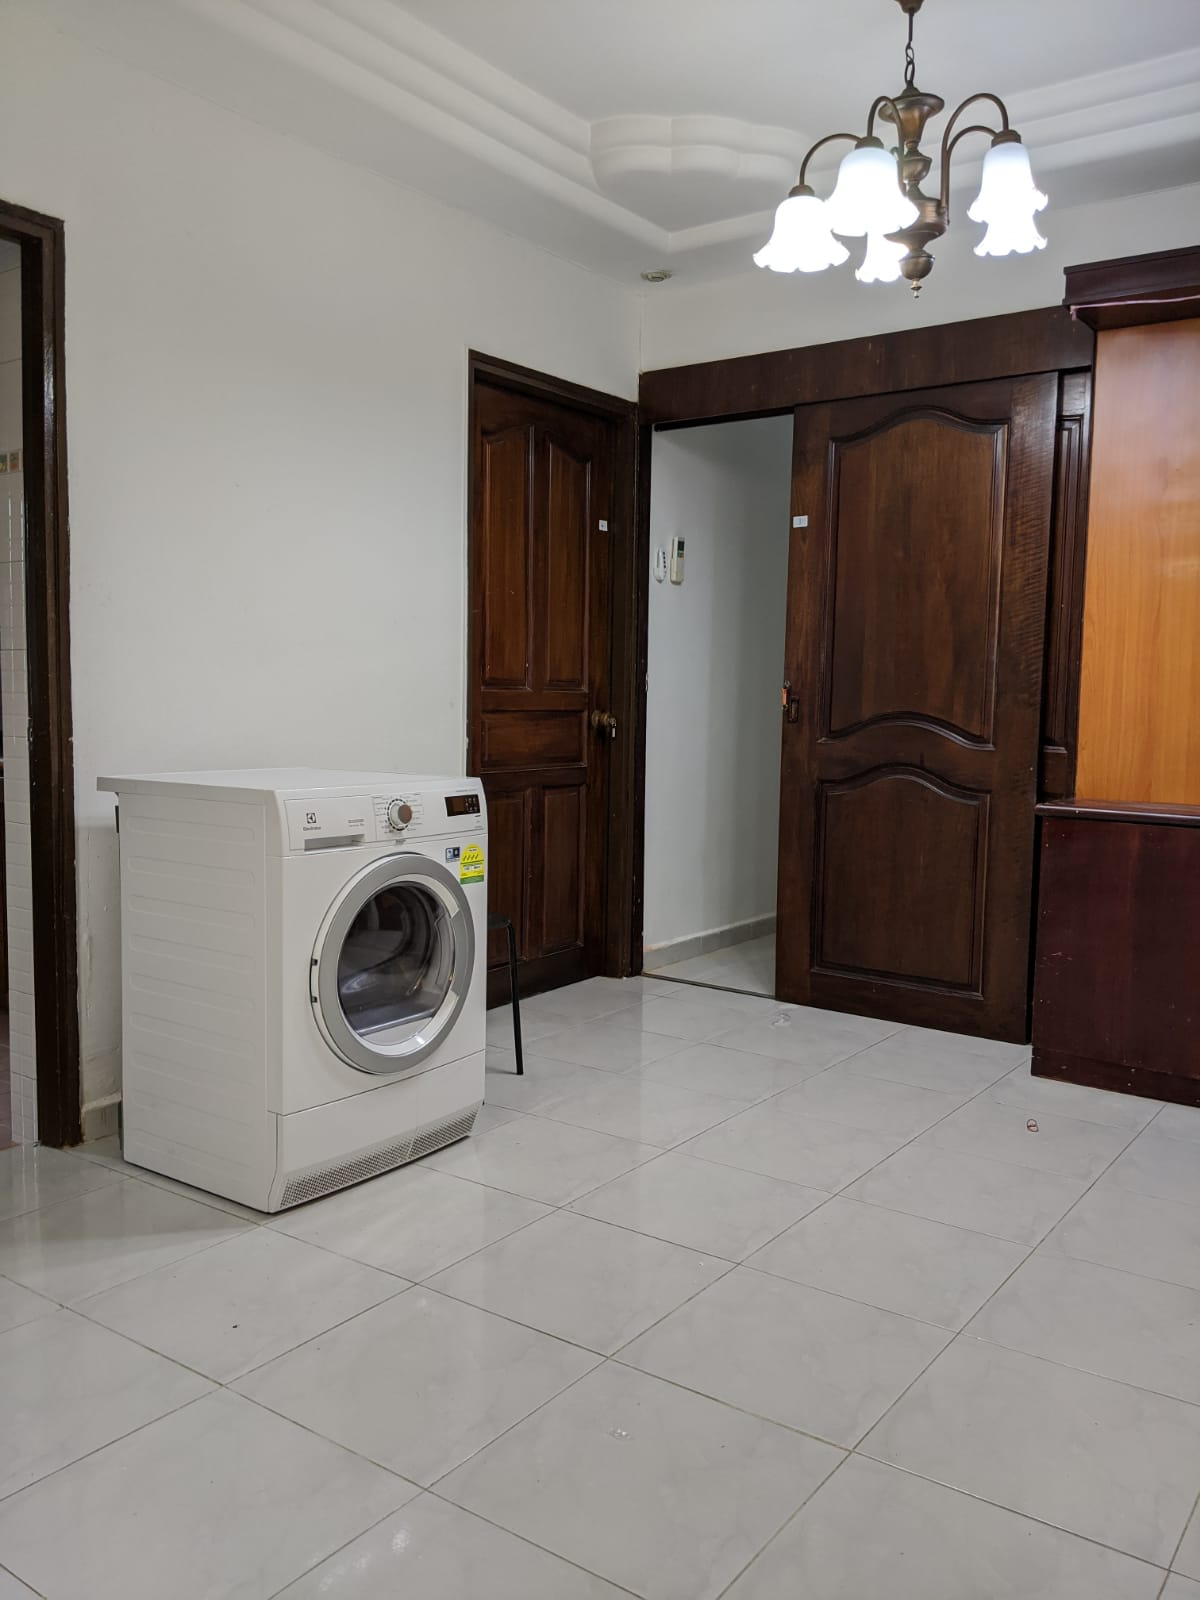 Dryer.jpeg